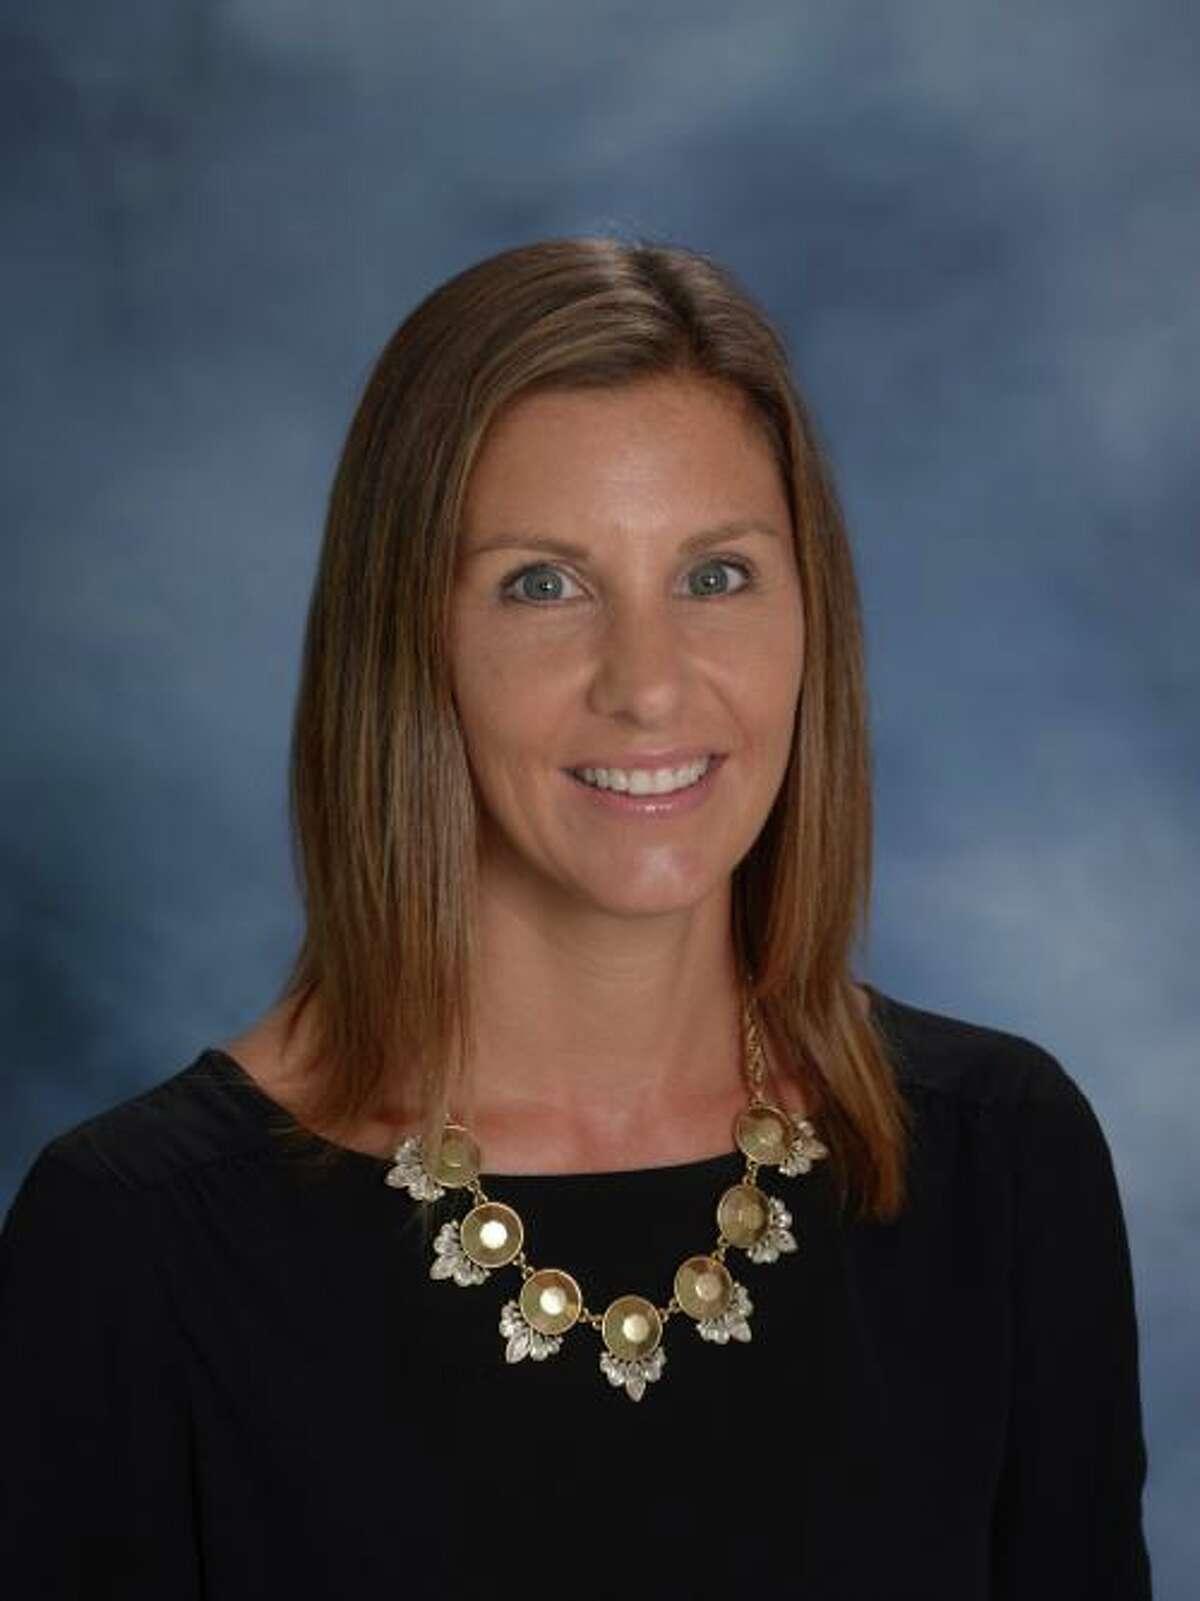 Kimberly Ambrosio, principal of Long Lots Elementary School in Westport